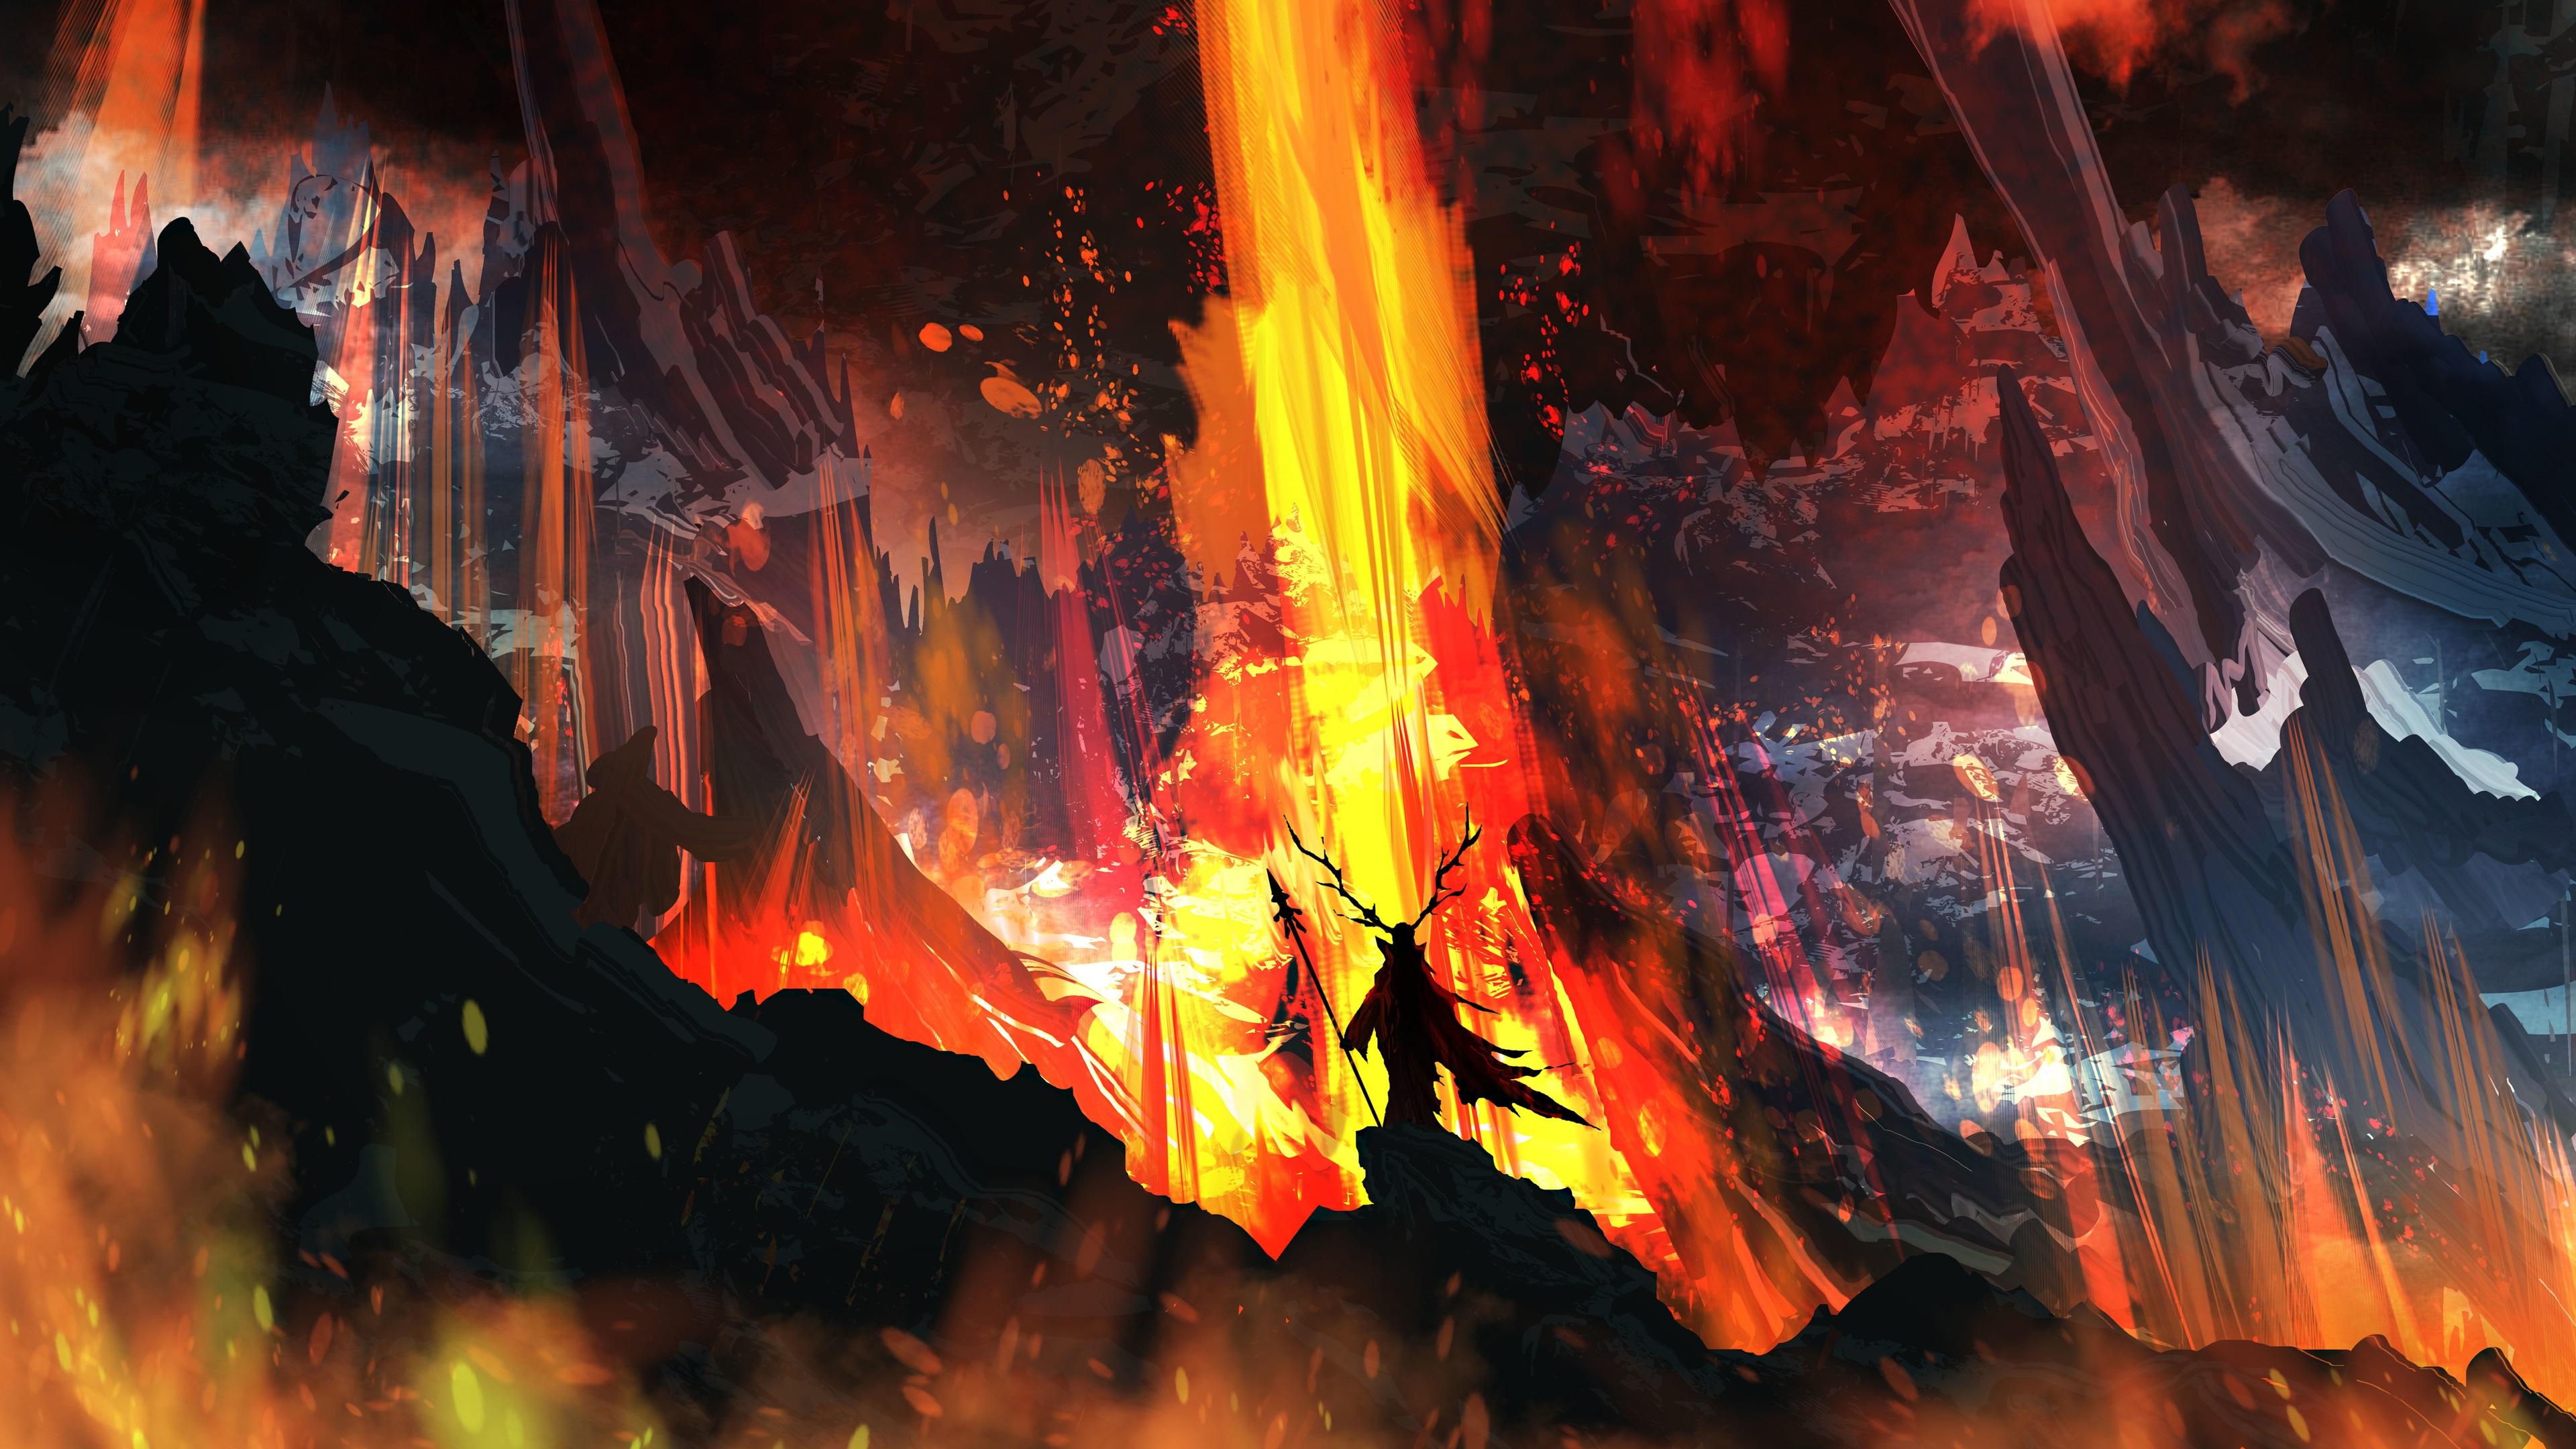 Fondos De Pantalla De Lava: Cuadro De Arte, Fuego, Lava, Cuernos Fondos De Pantalla